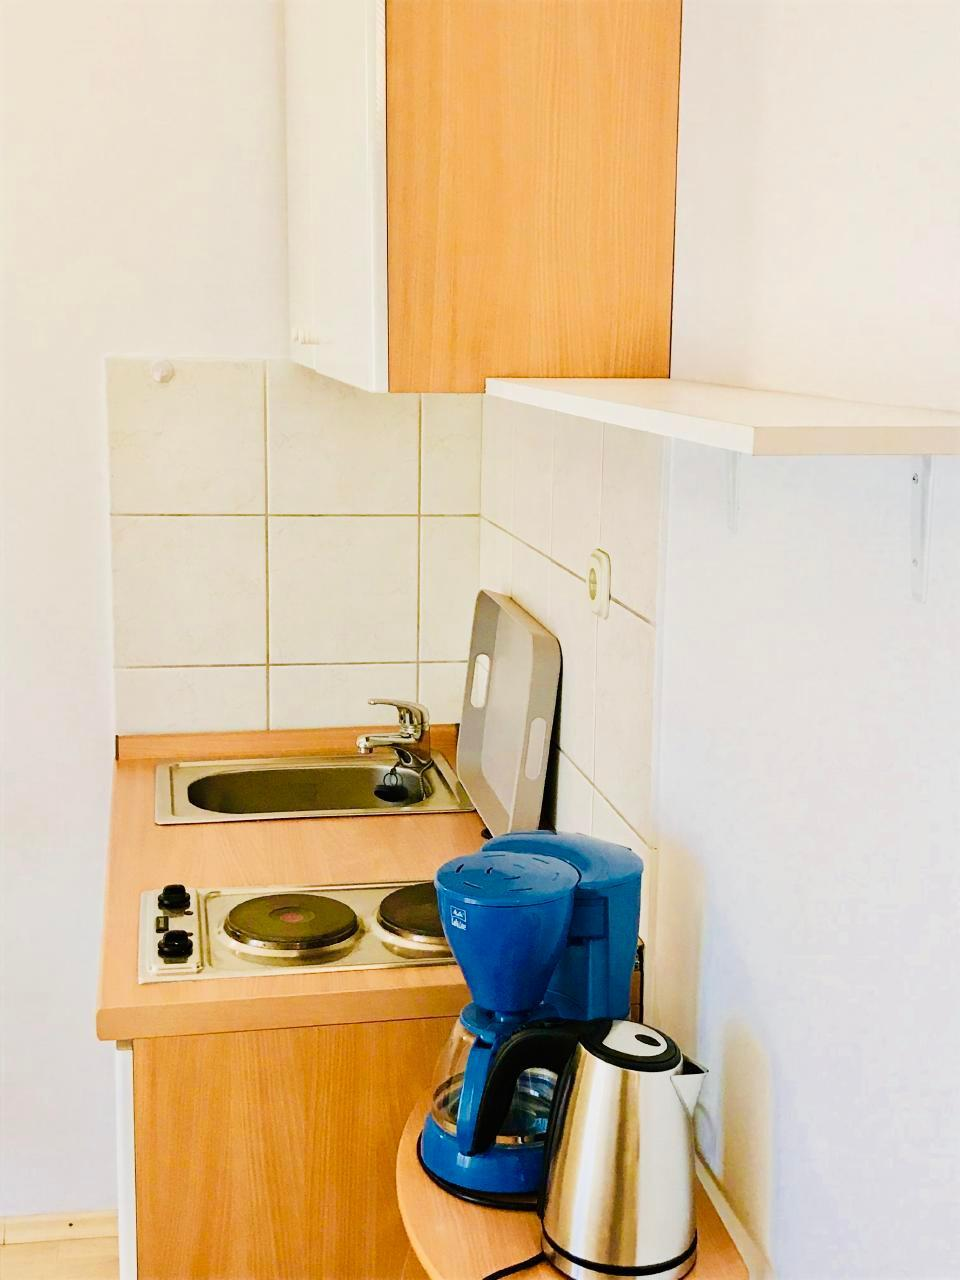 Ferienwohnung Apartmenthaus Ruza 3 - Studio (98391), Kaštel Štafilić, , Dalmatien, Kroatien, Bild 7